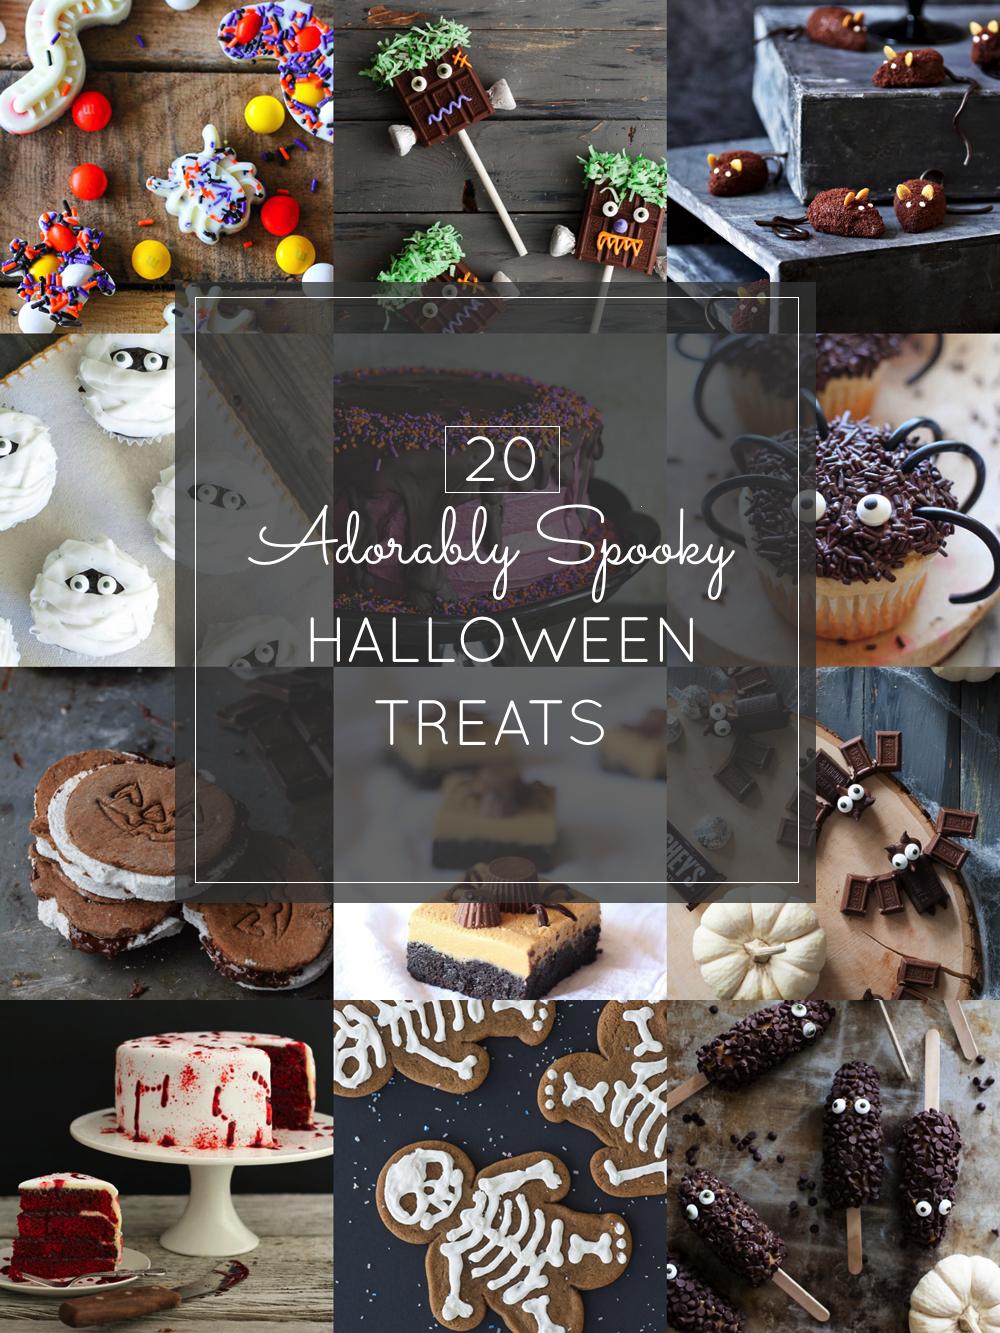 20 Adorably Spooky Scary Halloween Sweets Treats Desserts Recipes